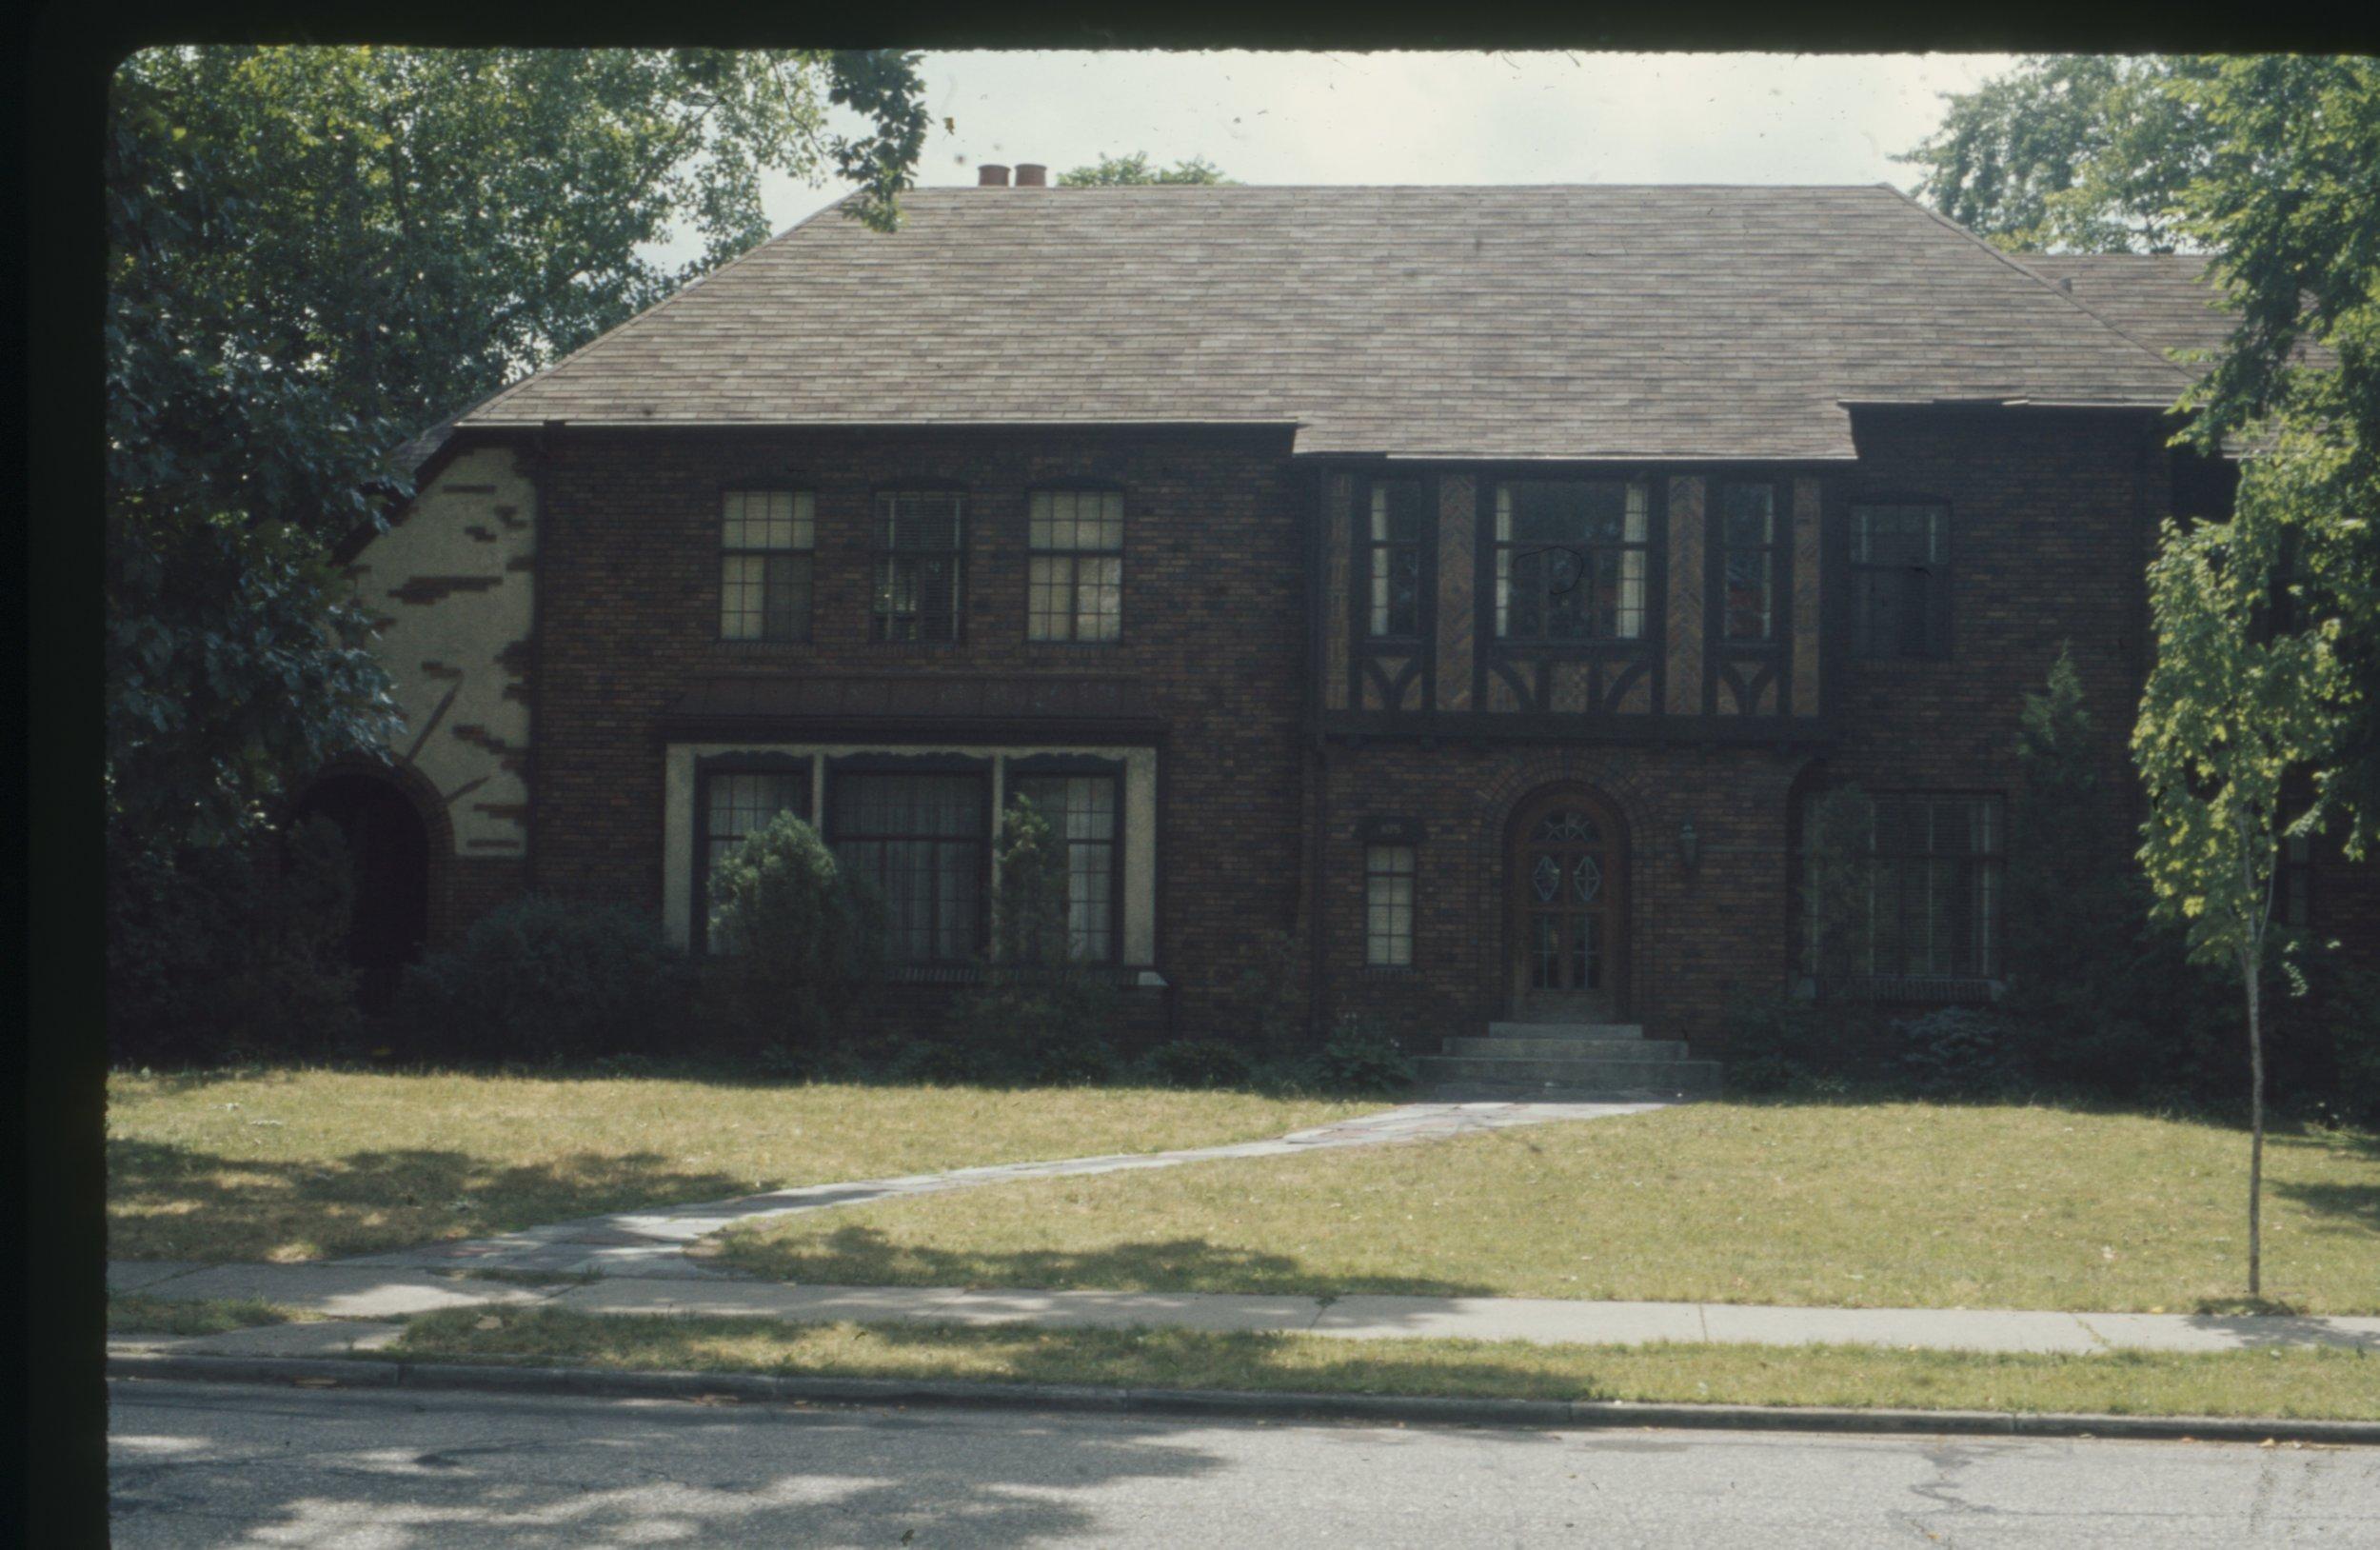 675 W. Boston 1974.jpg